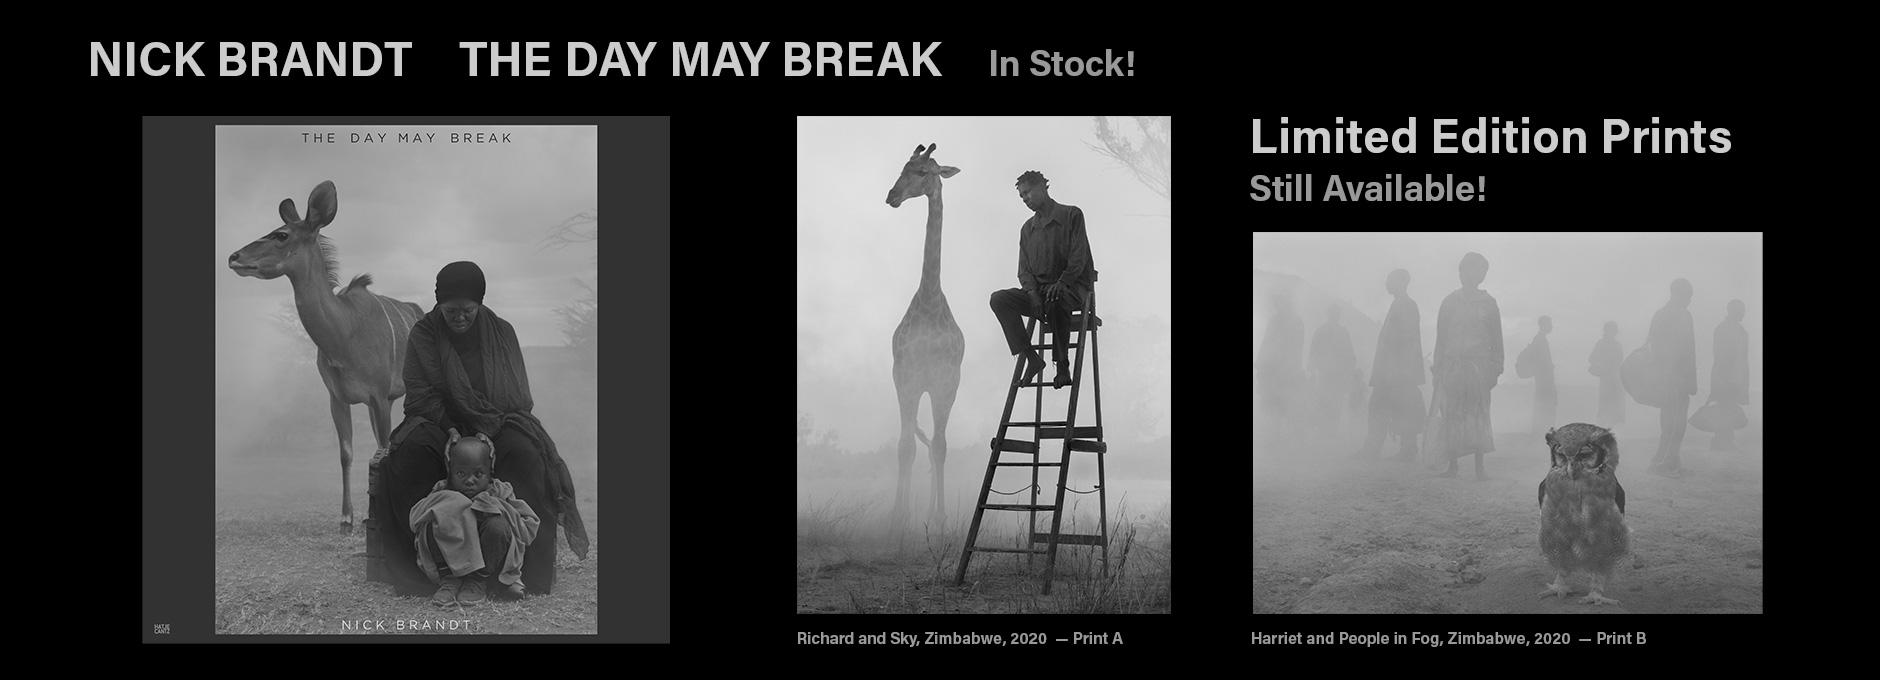 The Day May Break - Nick Brandt